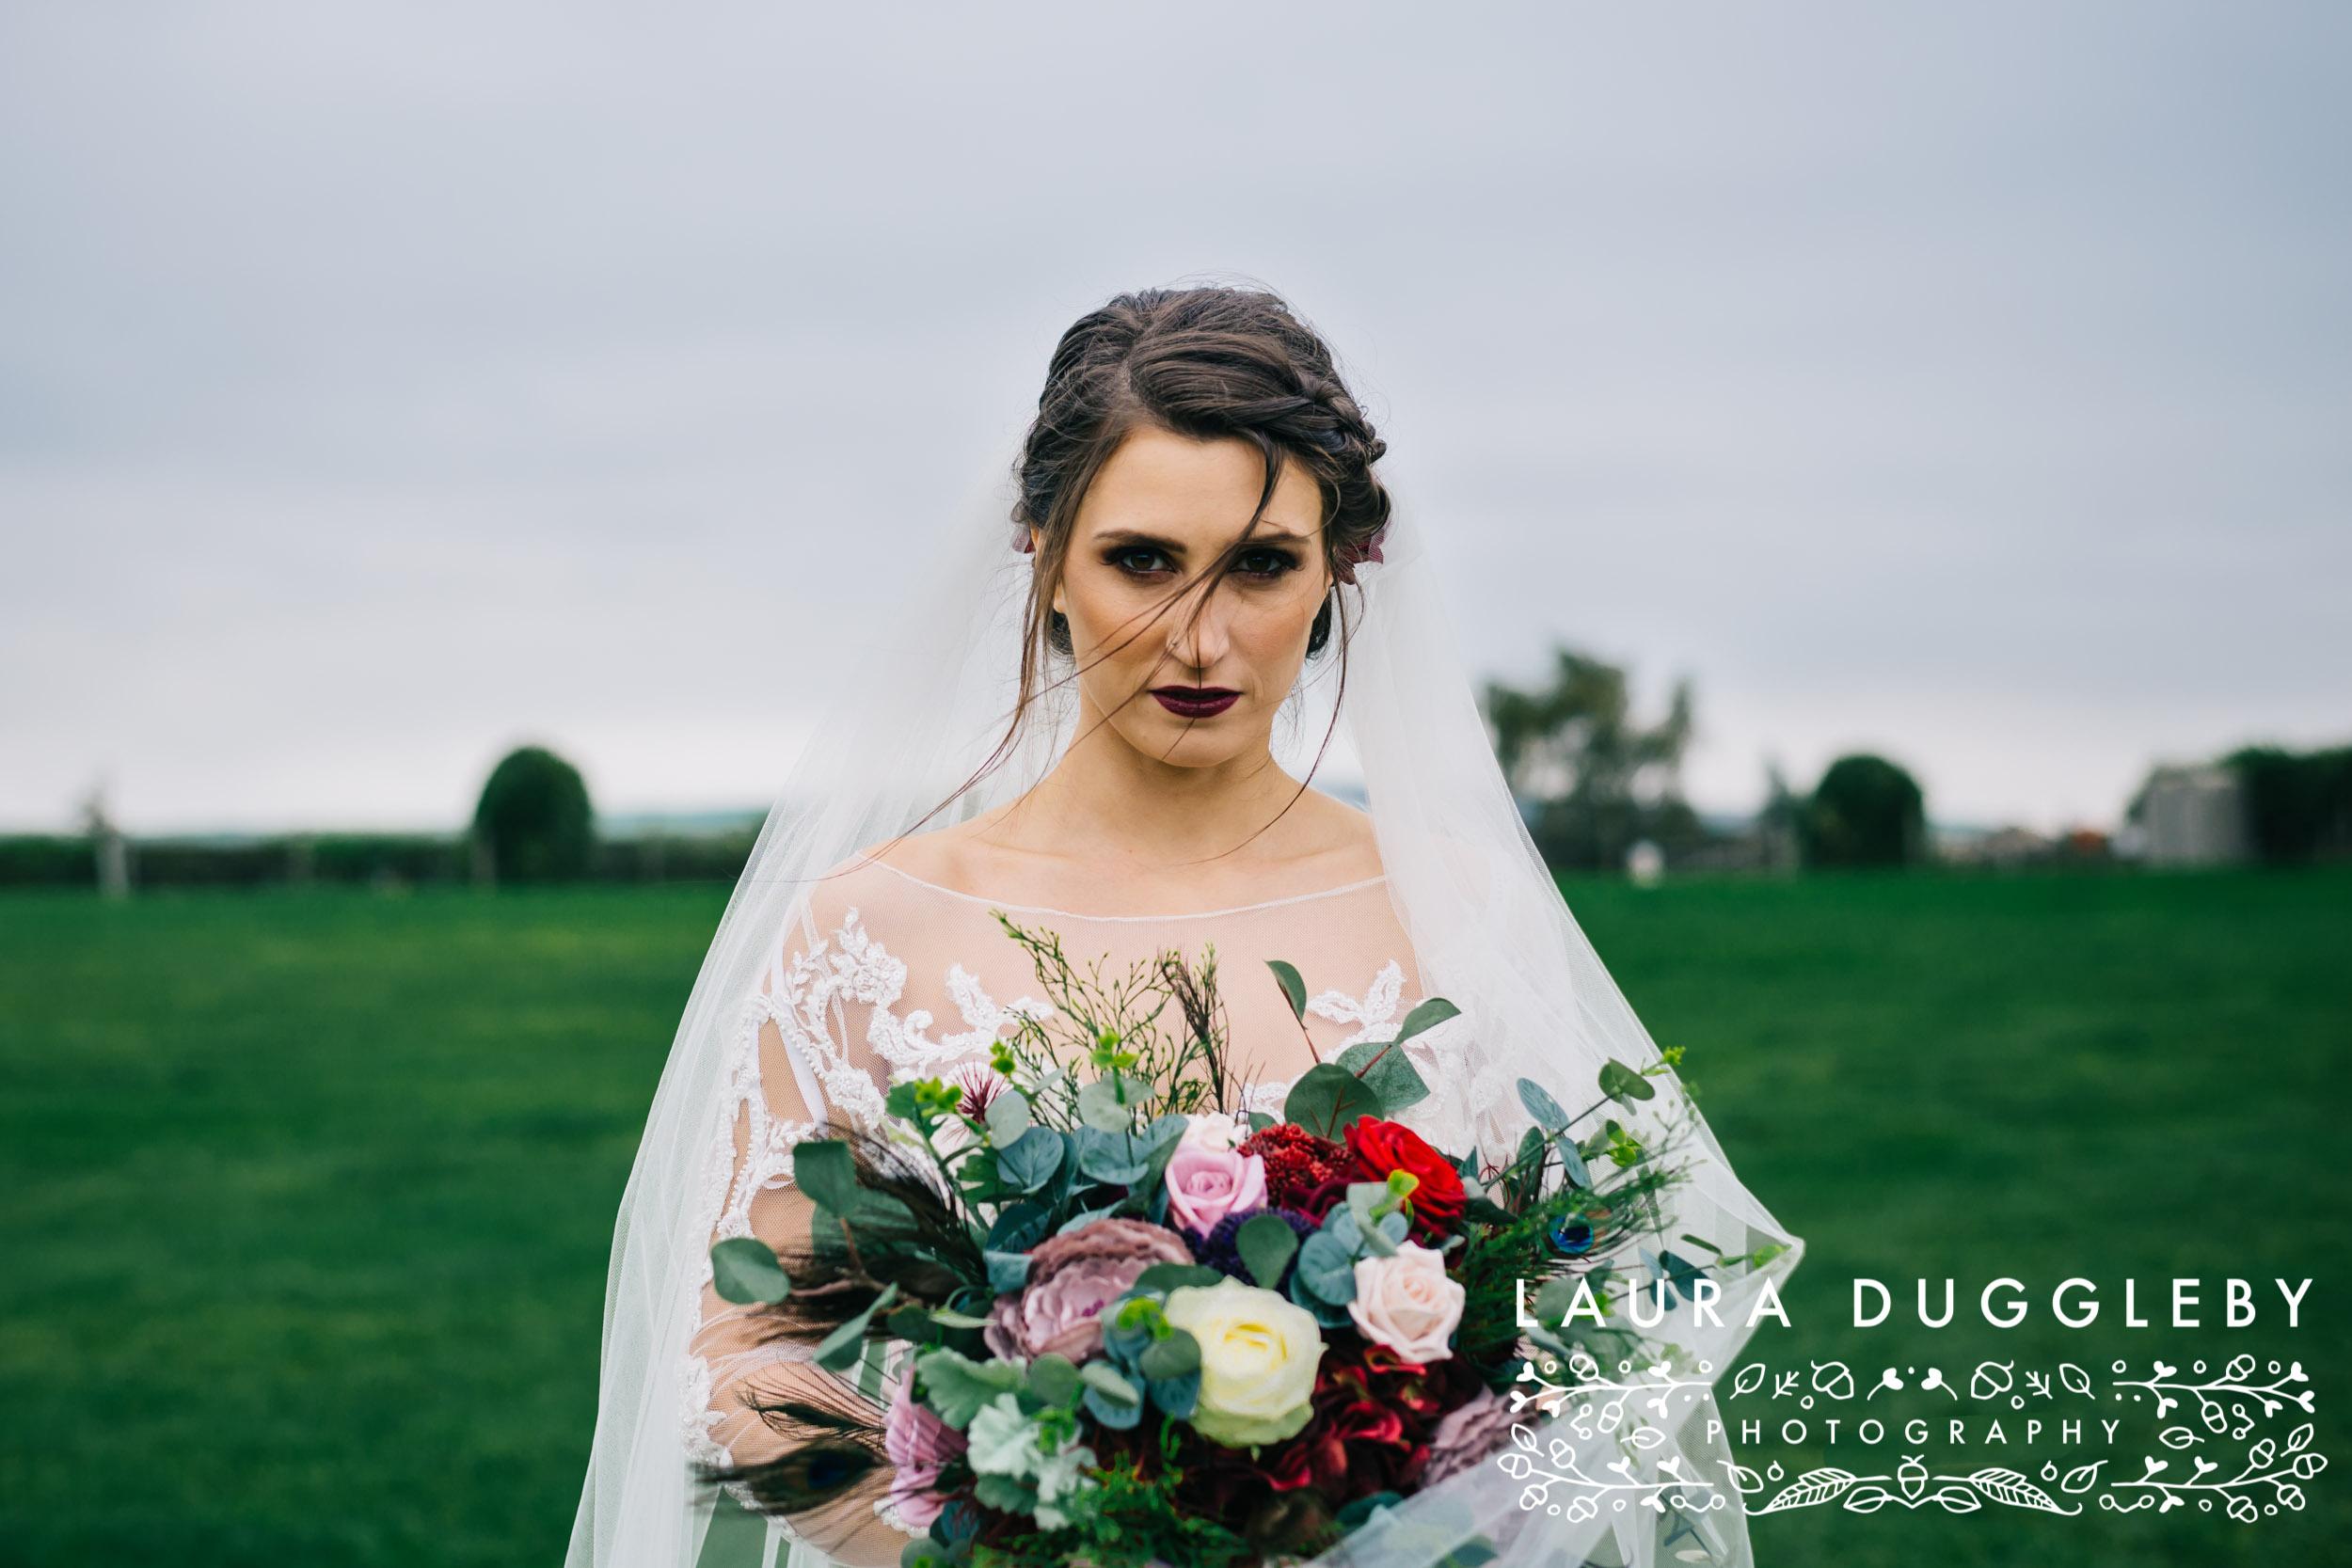 Skipton Wedding Photographer - Thornton Hall Country Park Wedding Photographer